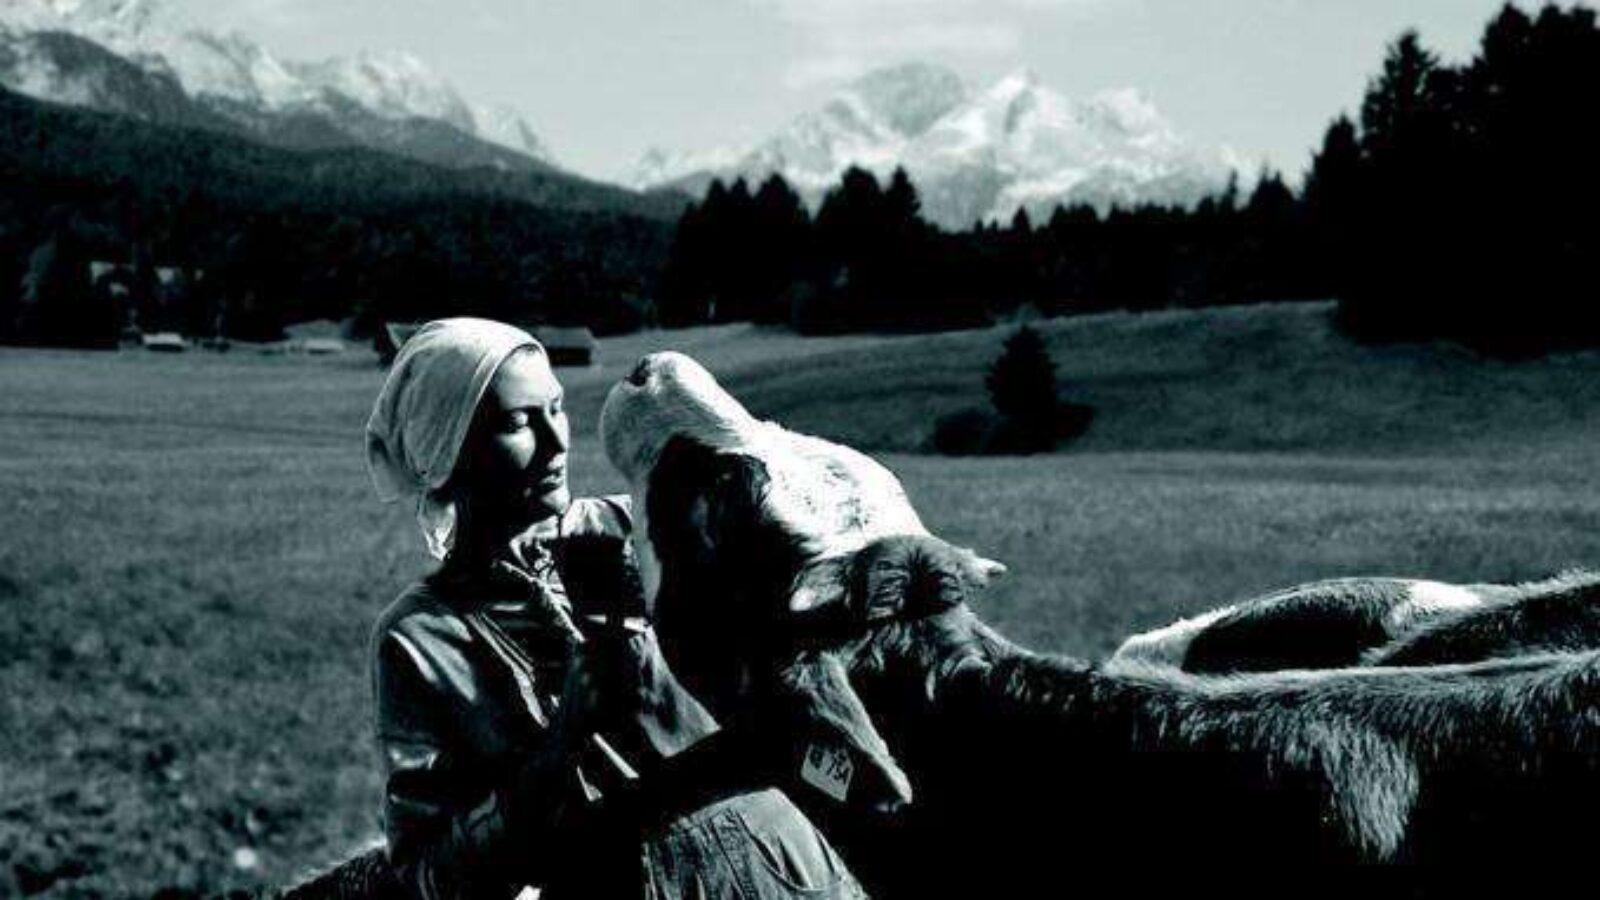 Film des Monats (Juni): Still (Platz 2)